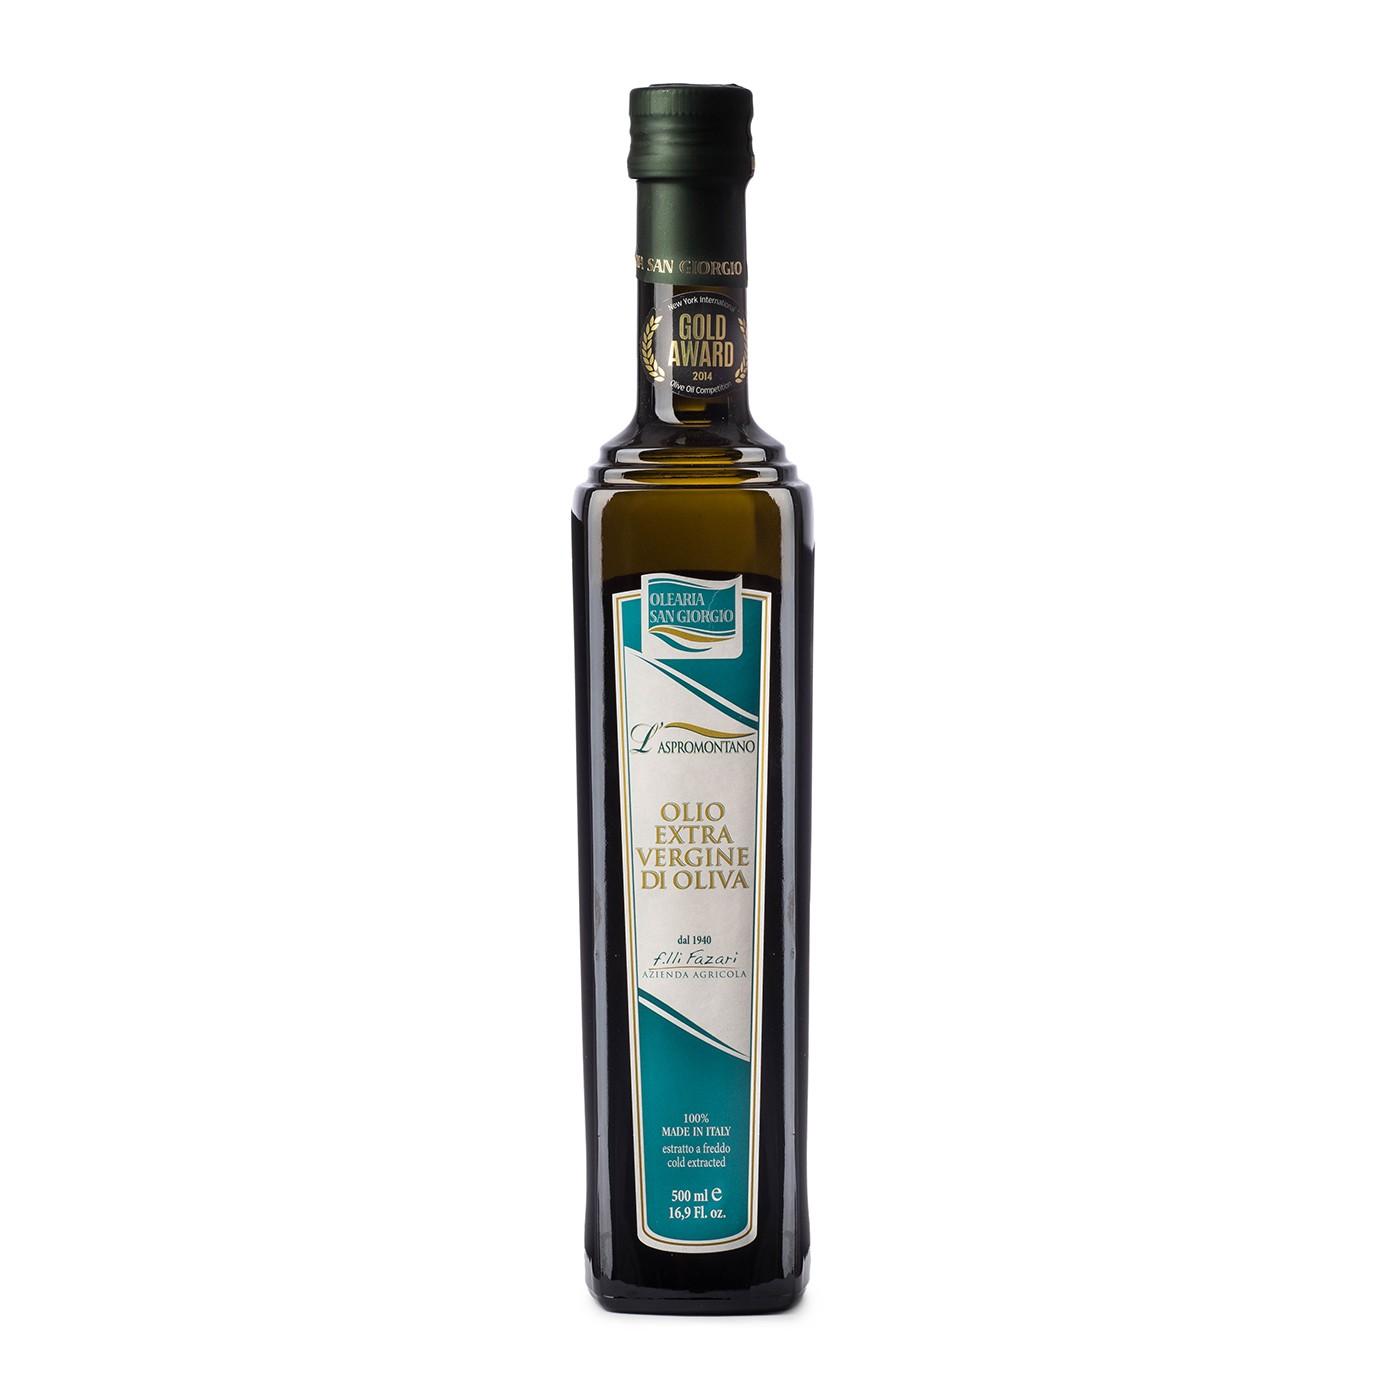 Extra Virgin Olive Oil Aspromontano 16.9 oz